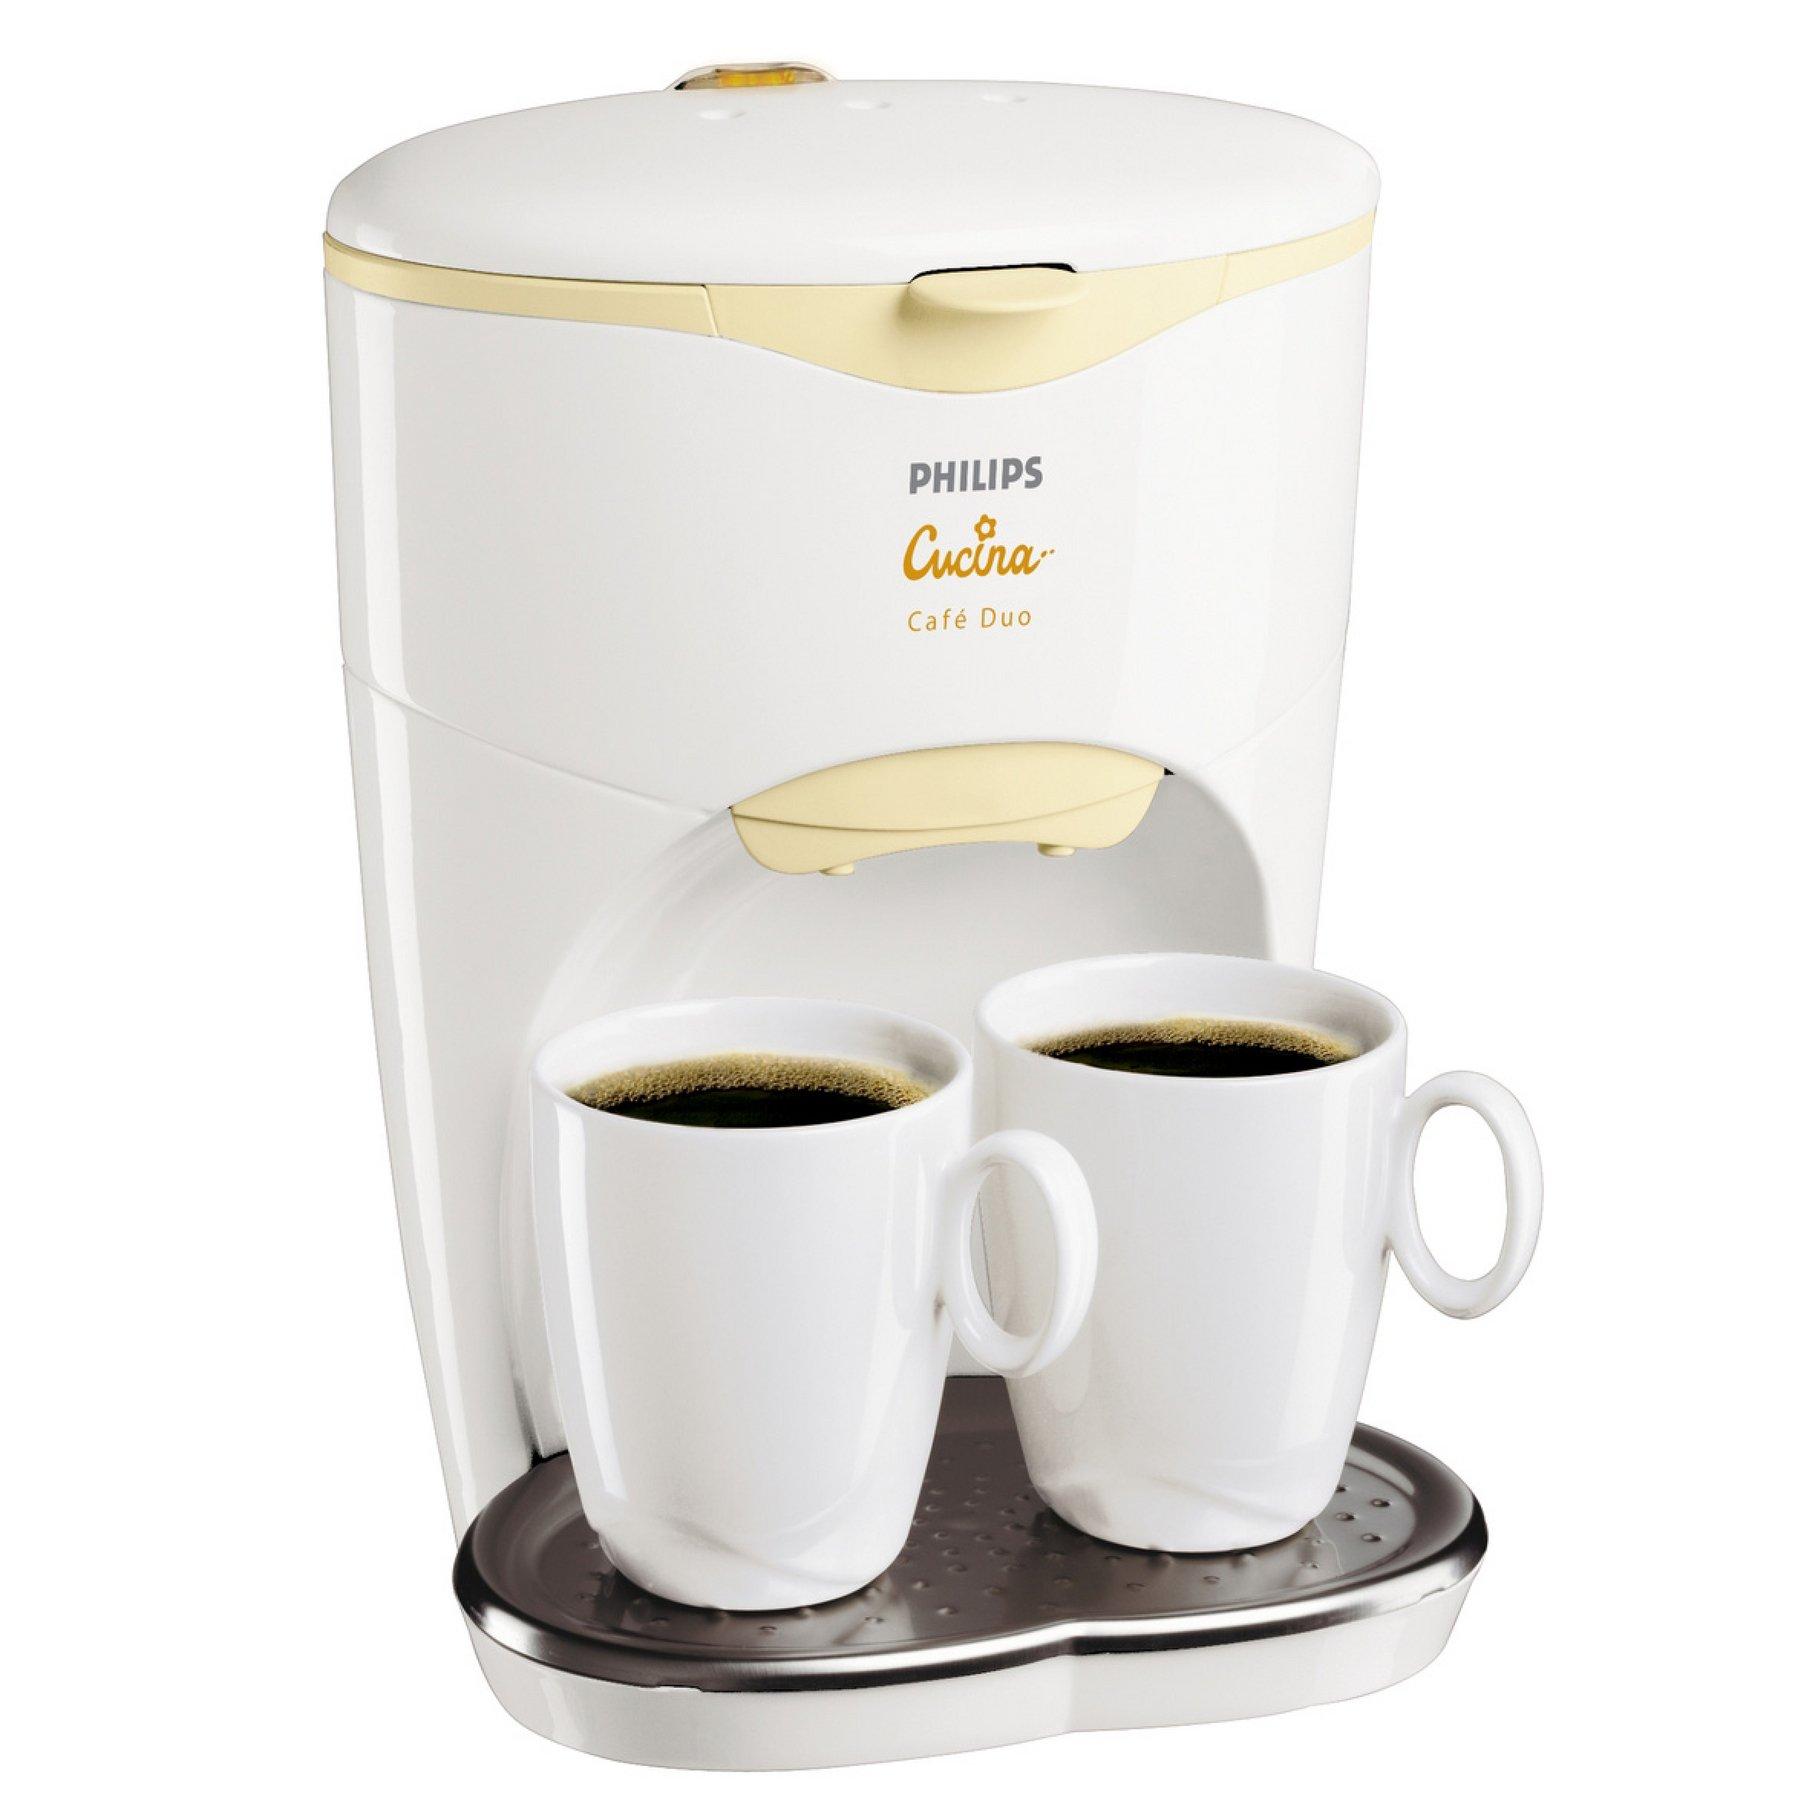 Philips Cucina Café Duo HD 7140/80, Crema, Blanco, 550 W, 110-130 ...